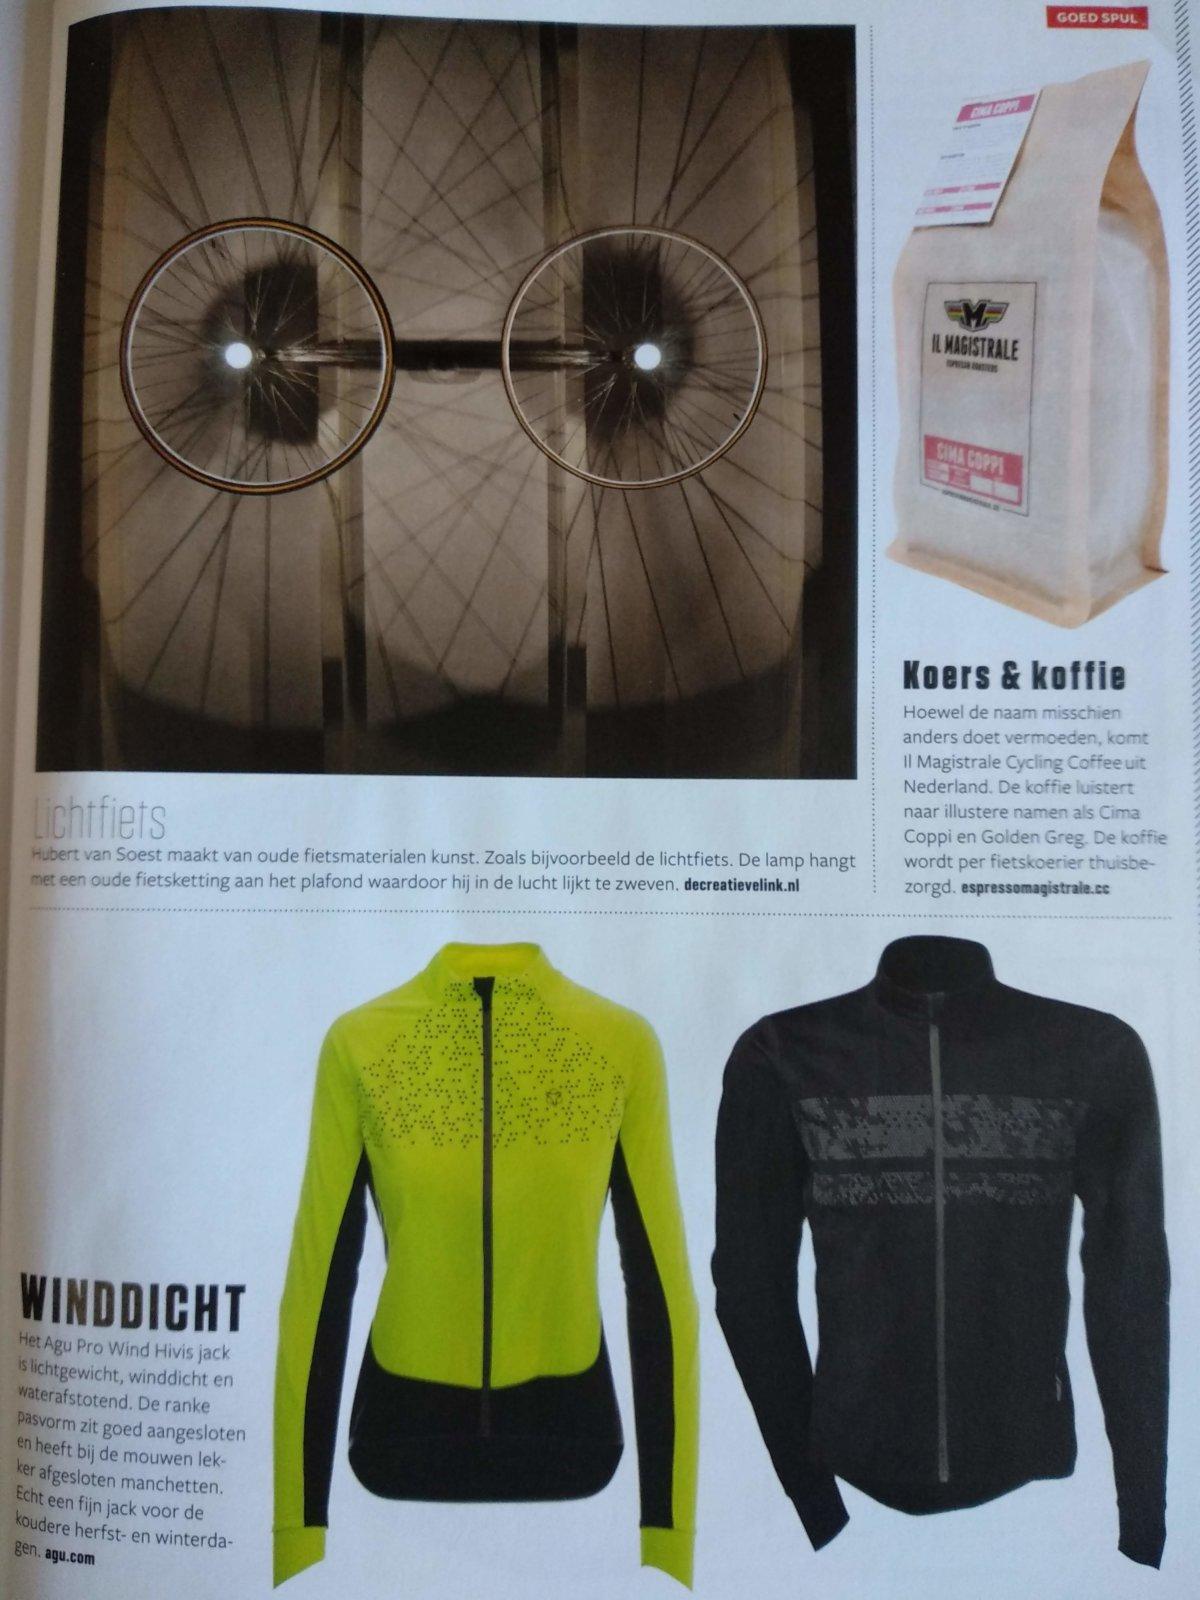 Lichtfiets Made By Decreatievelink In Bicycling Magazine Nr 3 Jaargang 2017